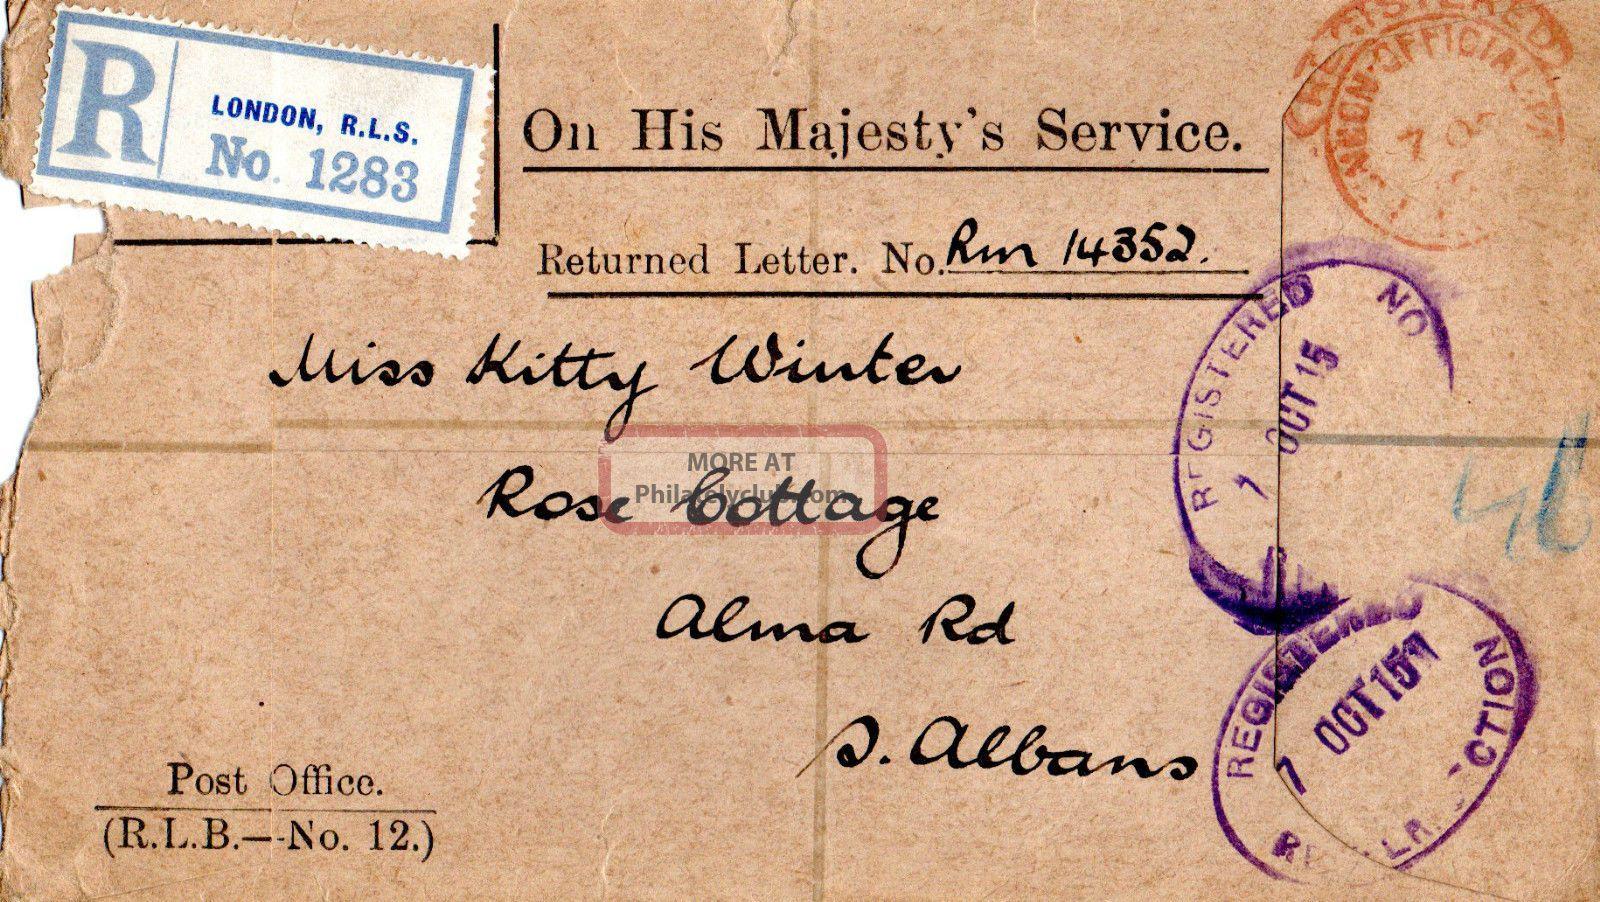 Gb 7 October 1915 World War 1 Registered Envelope Topical Stamps photo